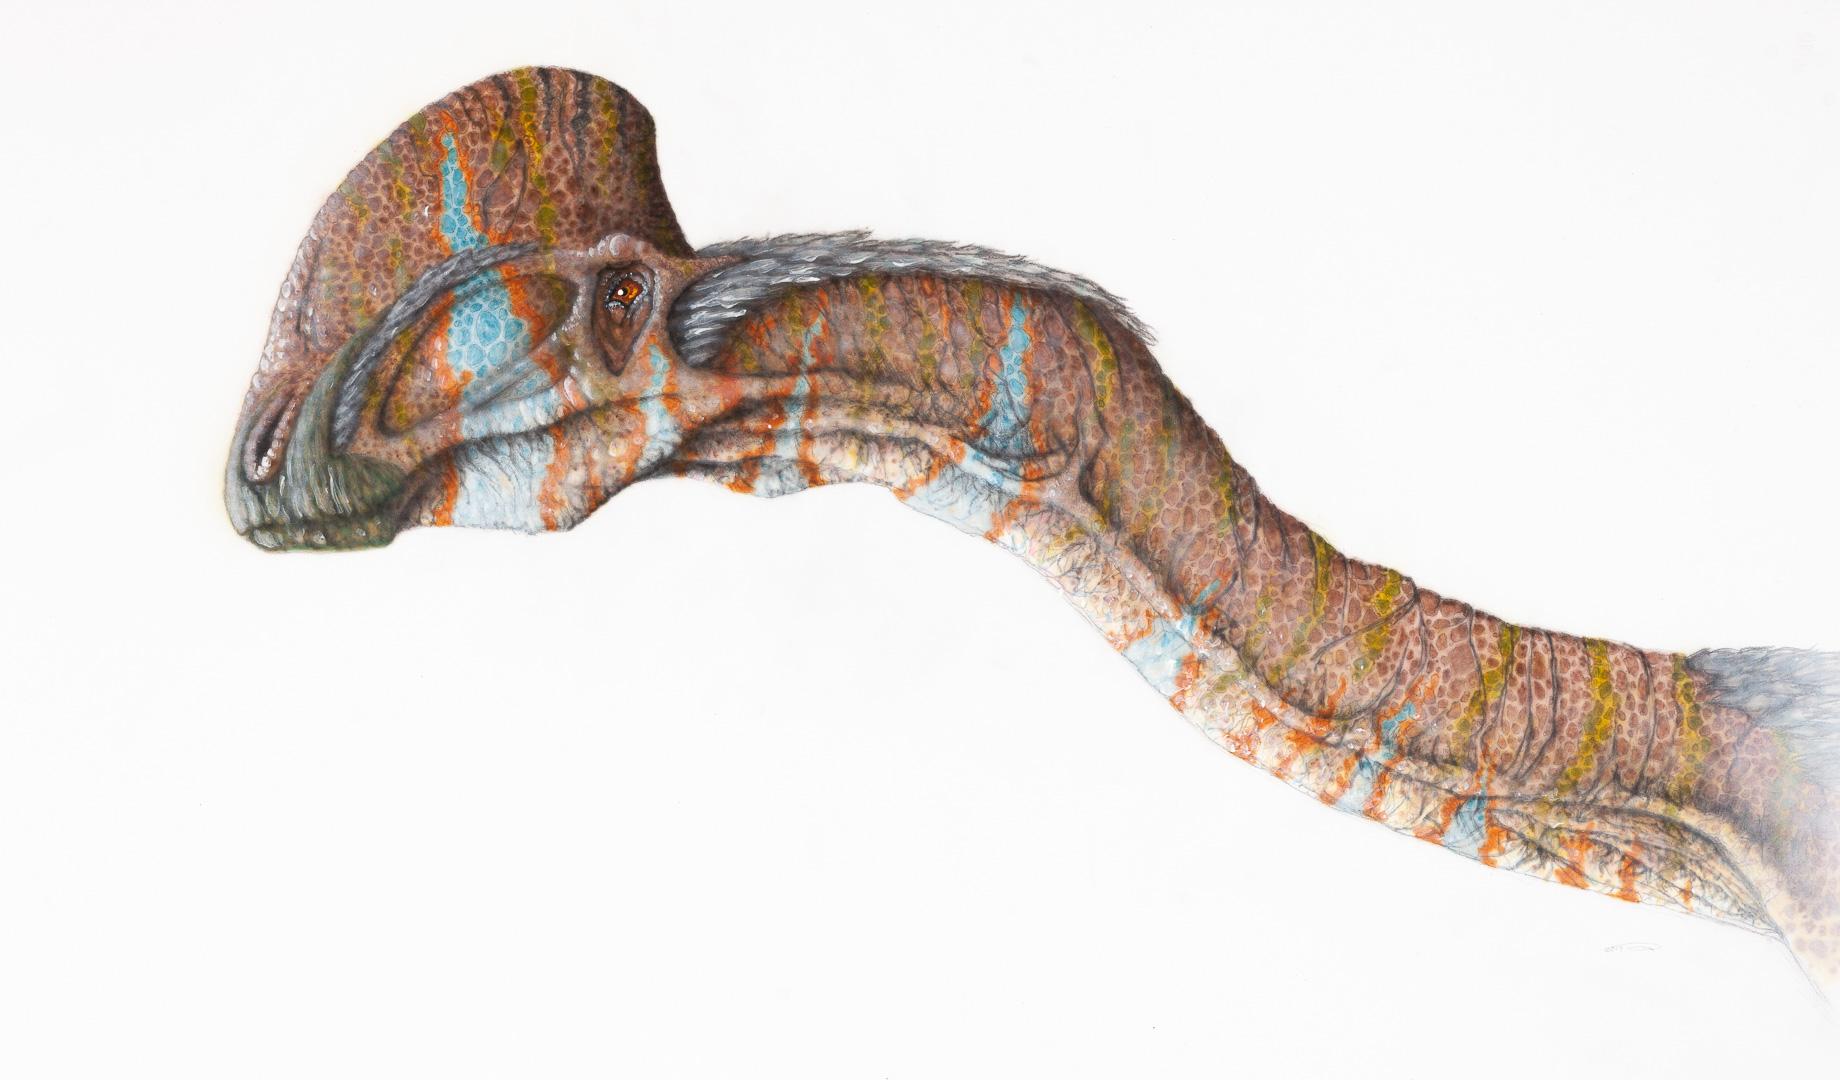 ojoraptorsaurus, head study, airbrush painting